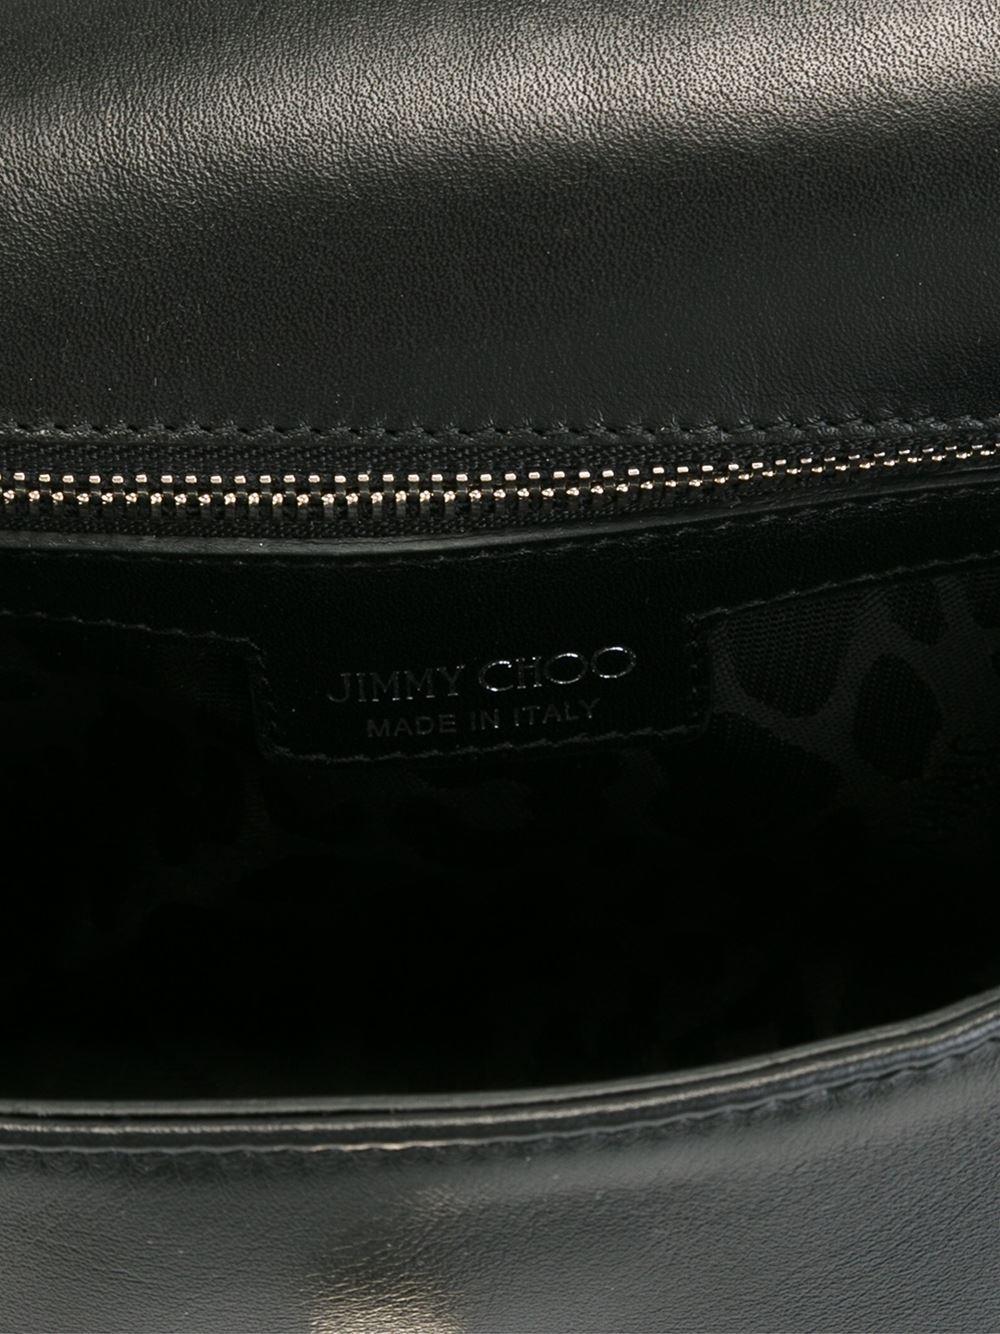 Jimmy Choo 'ruby' Crossbody Bag in Black